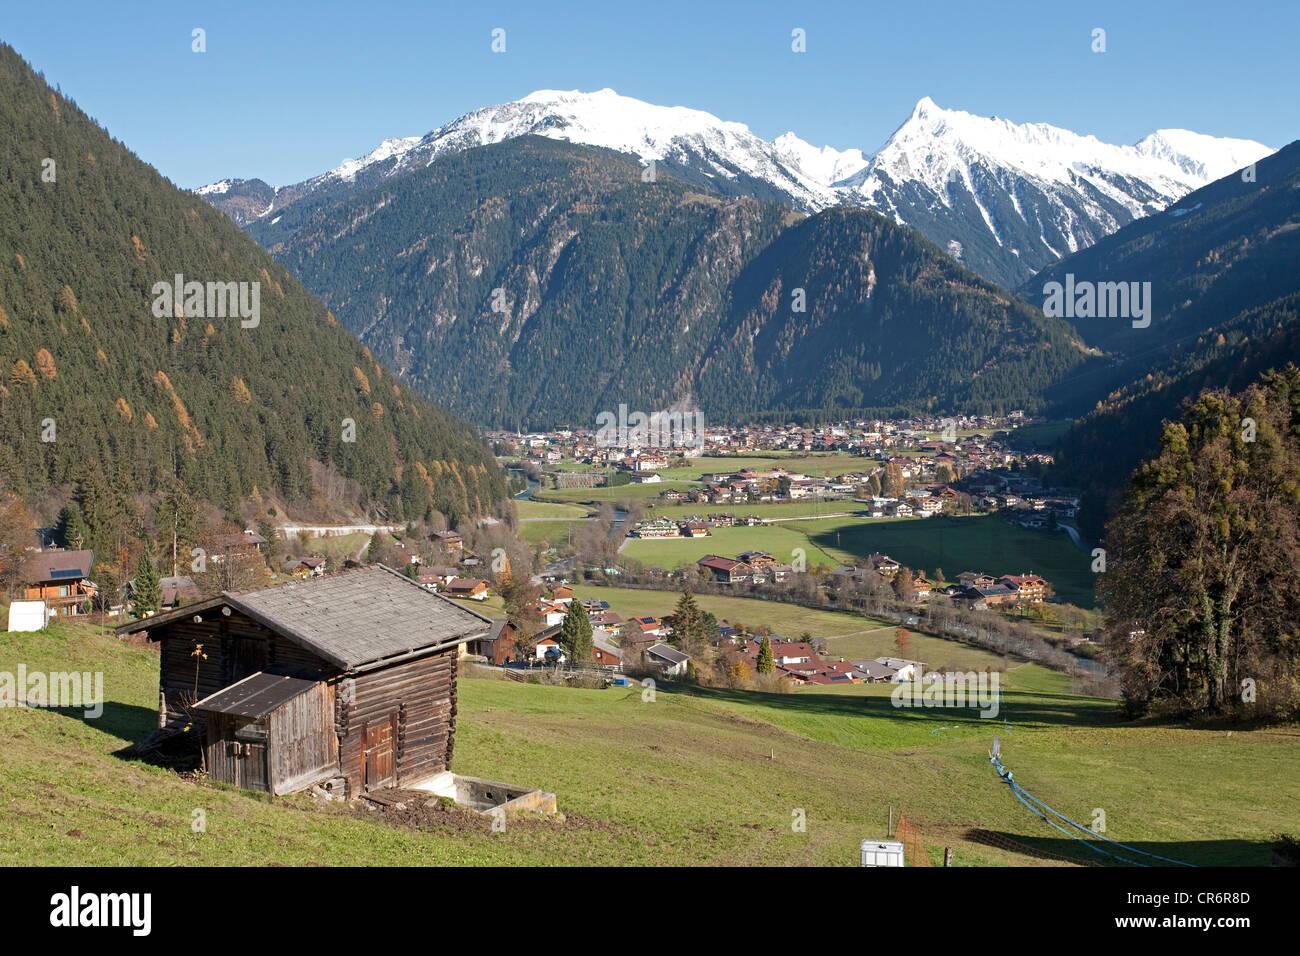 Mayrhofen, popular resort town in the Zillertal valley, Schwaz district, Zillertal valley, Tyrol, Austria, Europe - Stock Image